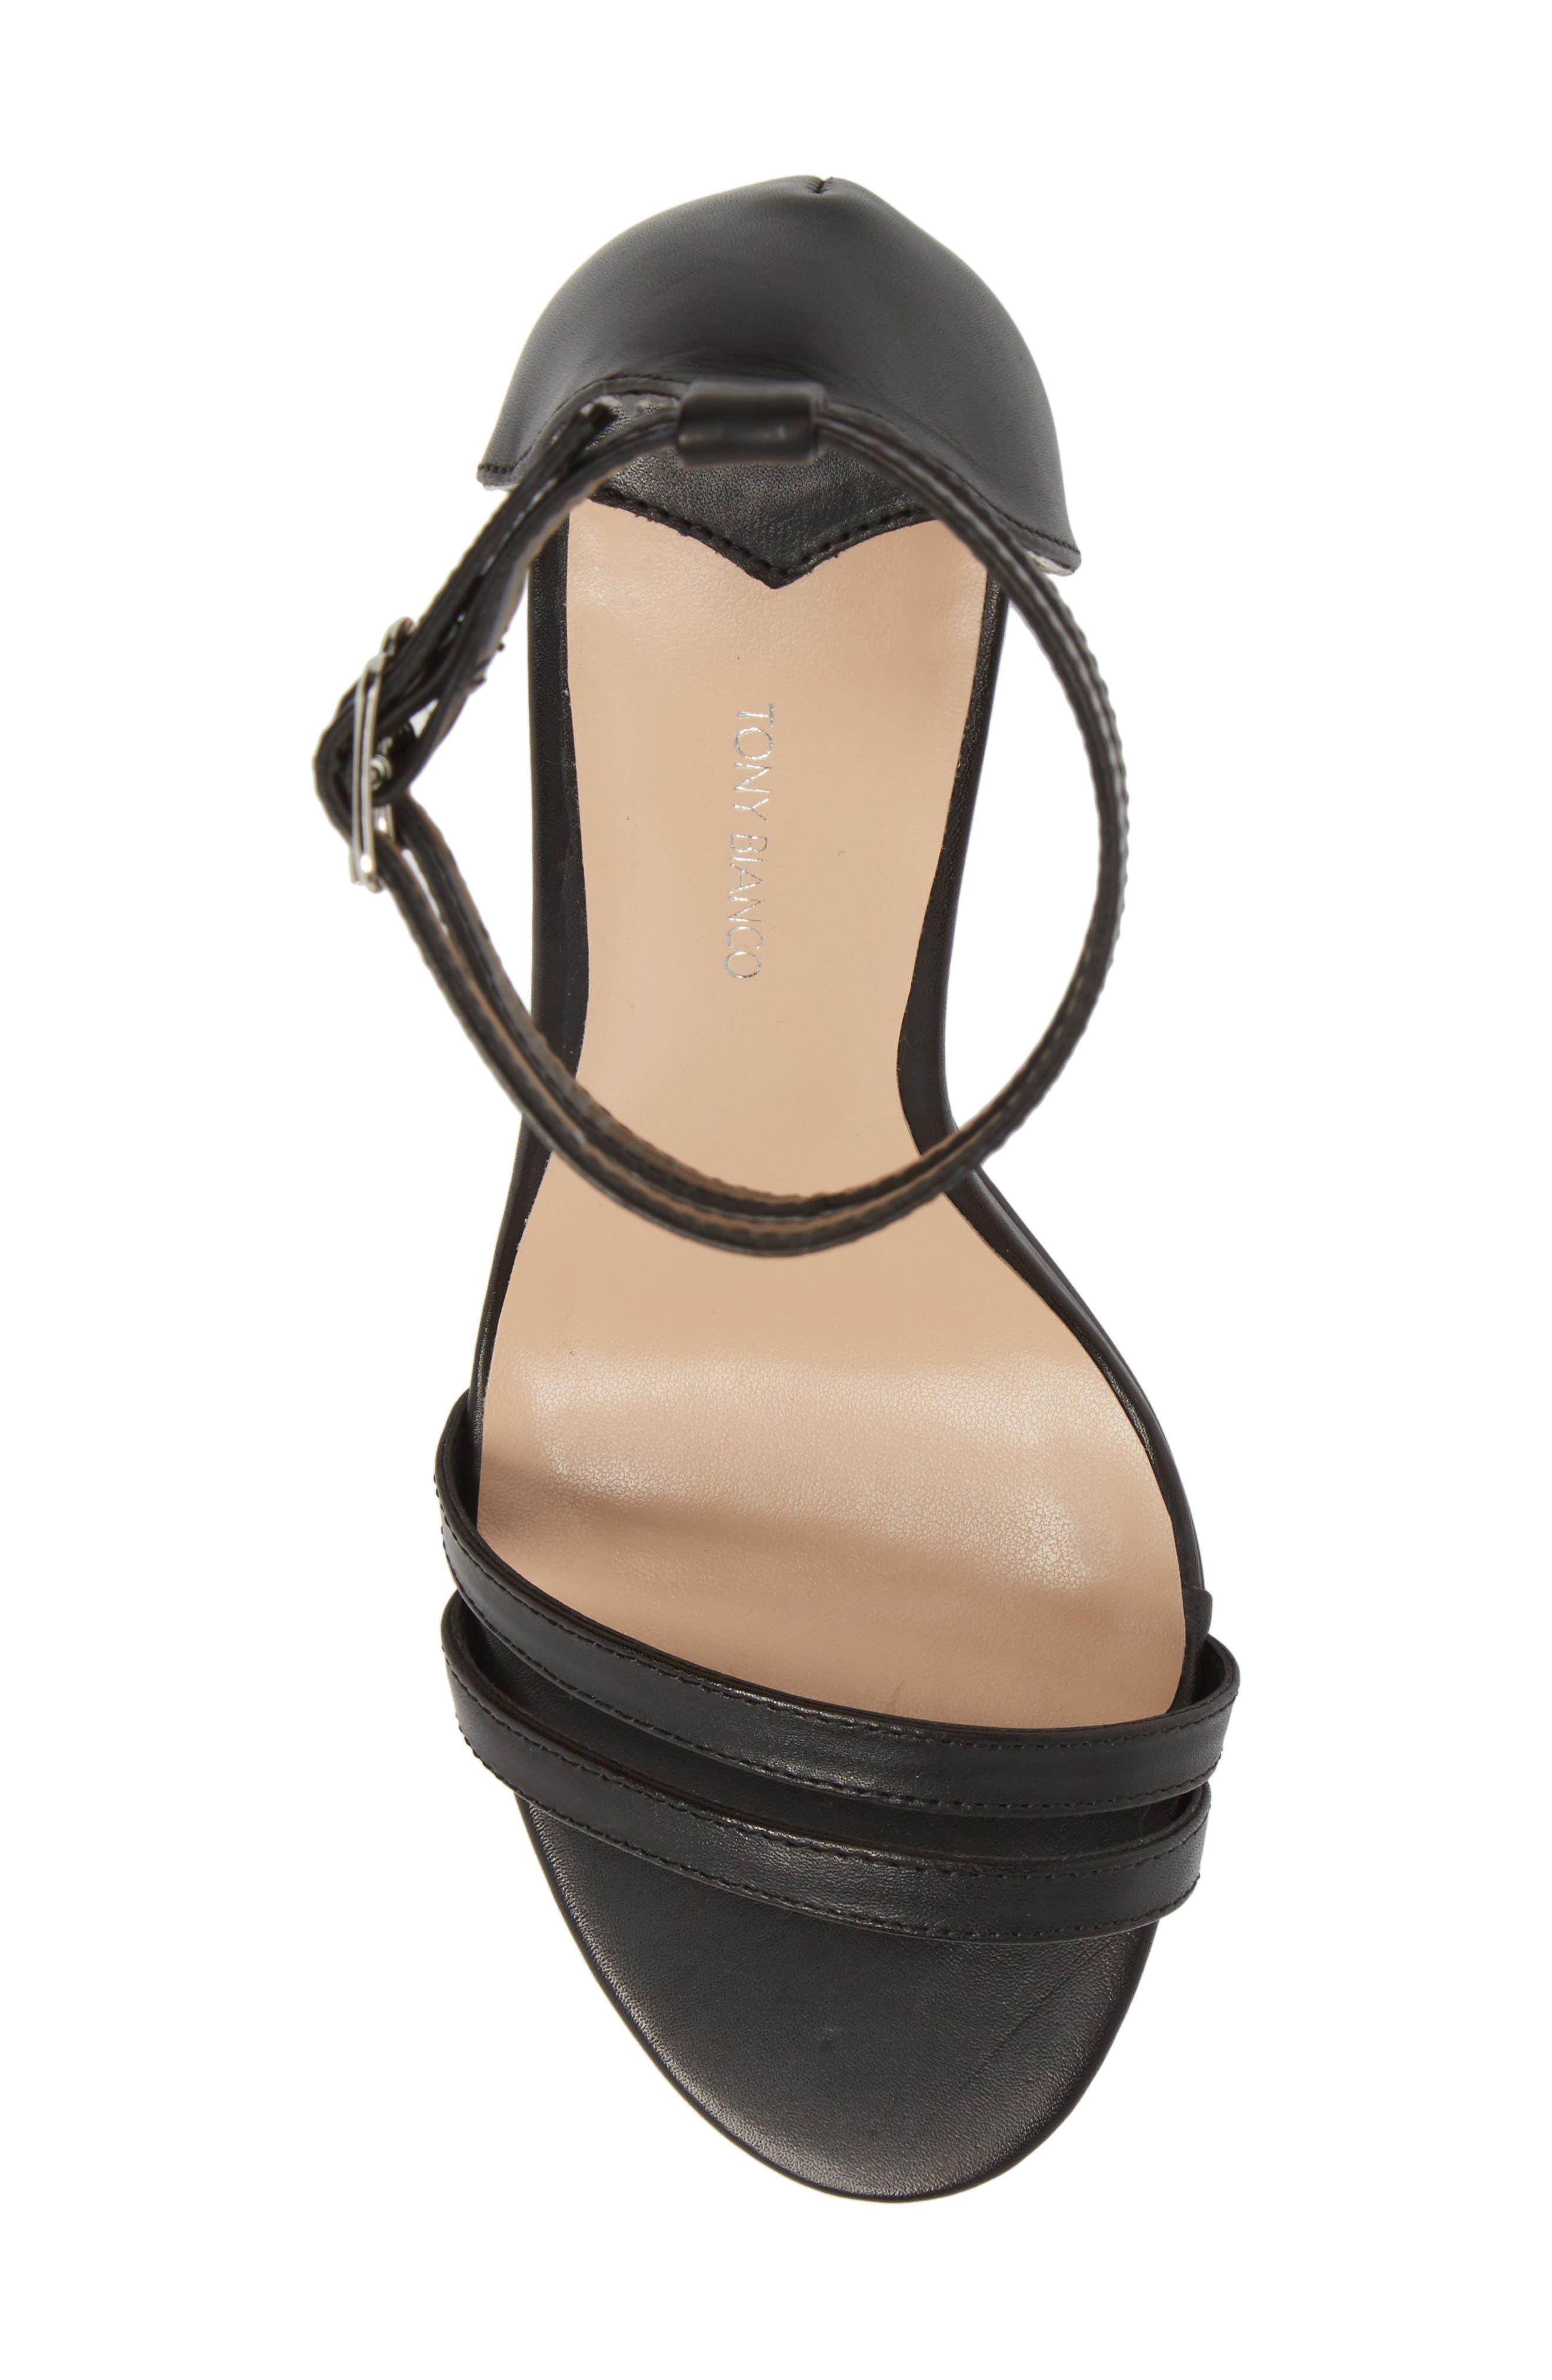 Kelly Block Heel Sandal,                             Alternate thumbnail 5, color,                             Black Monaco Leather